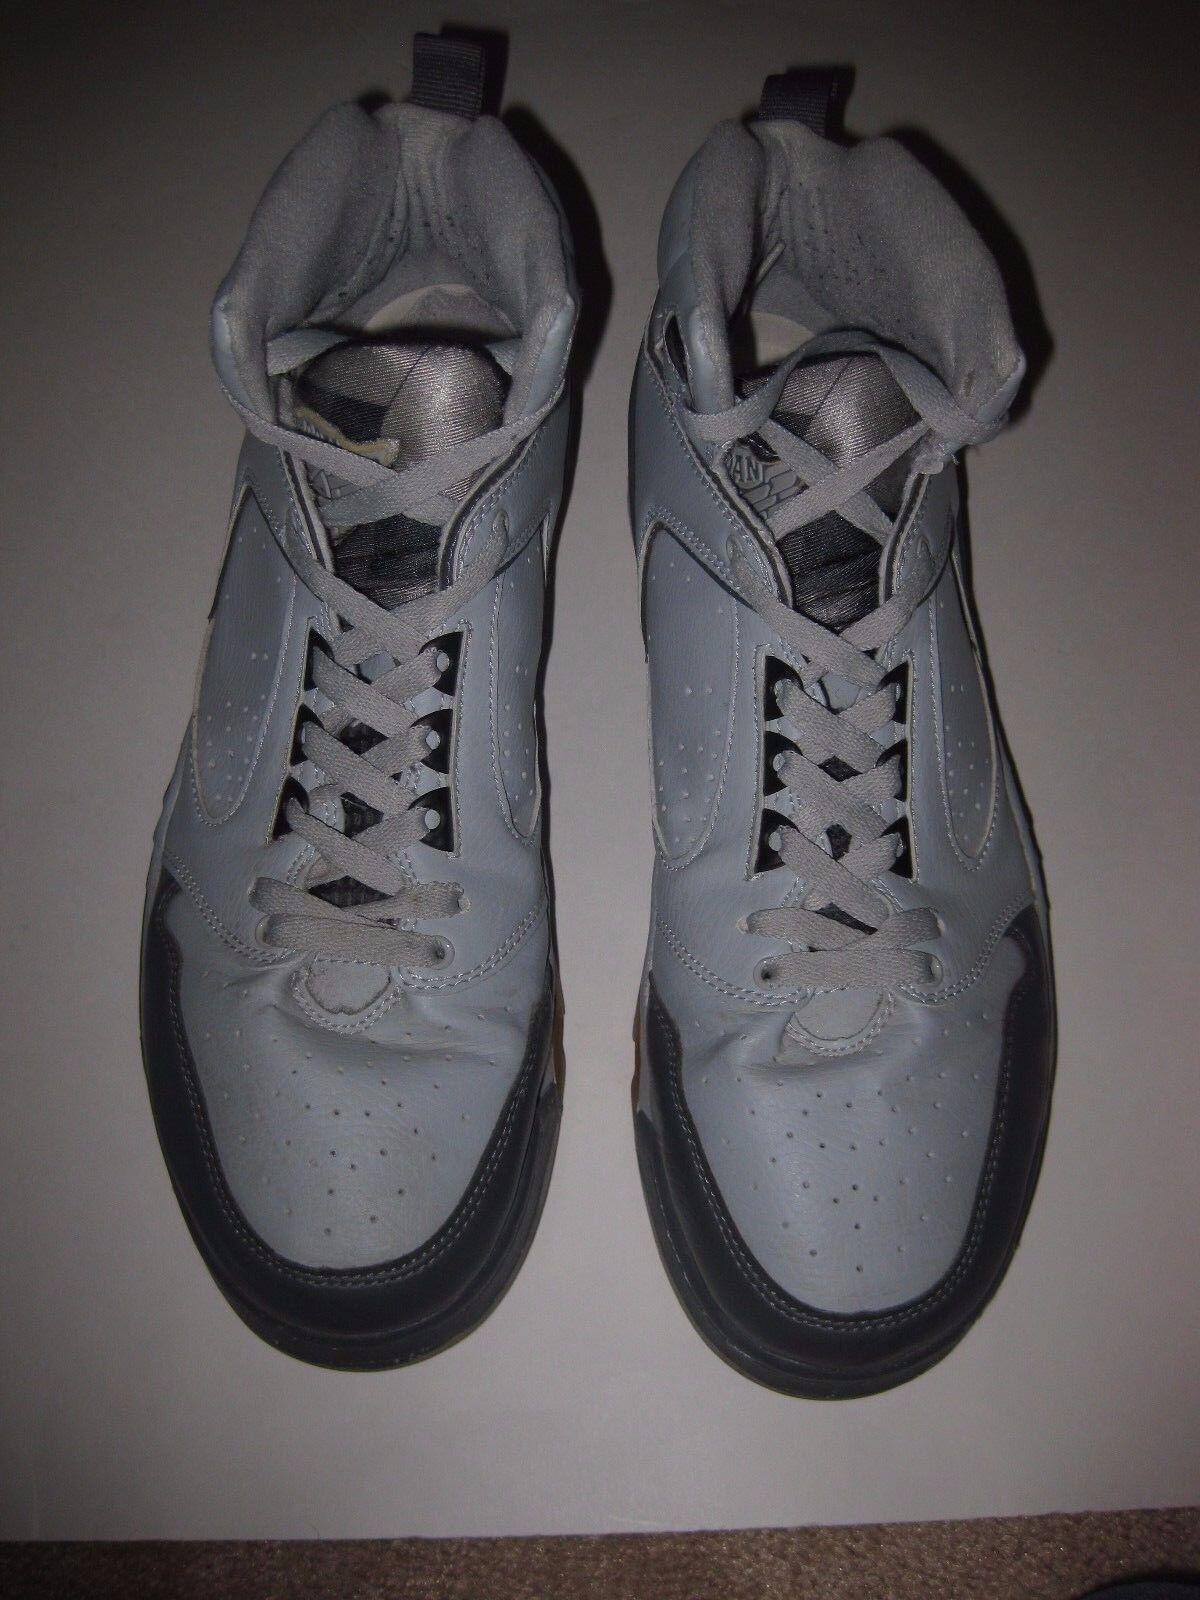 RARE Nike Air Jordan 2009 Release Ace 23 Retro shoes - Size 13 - Nice